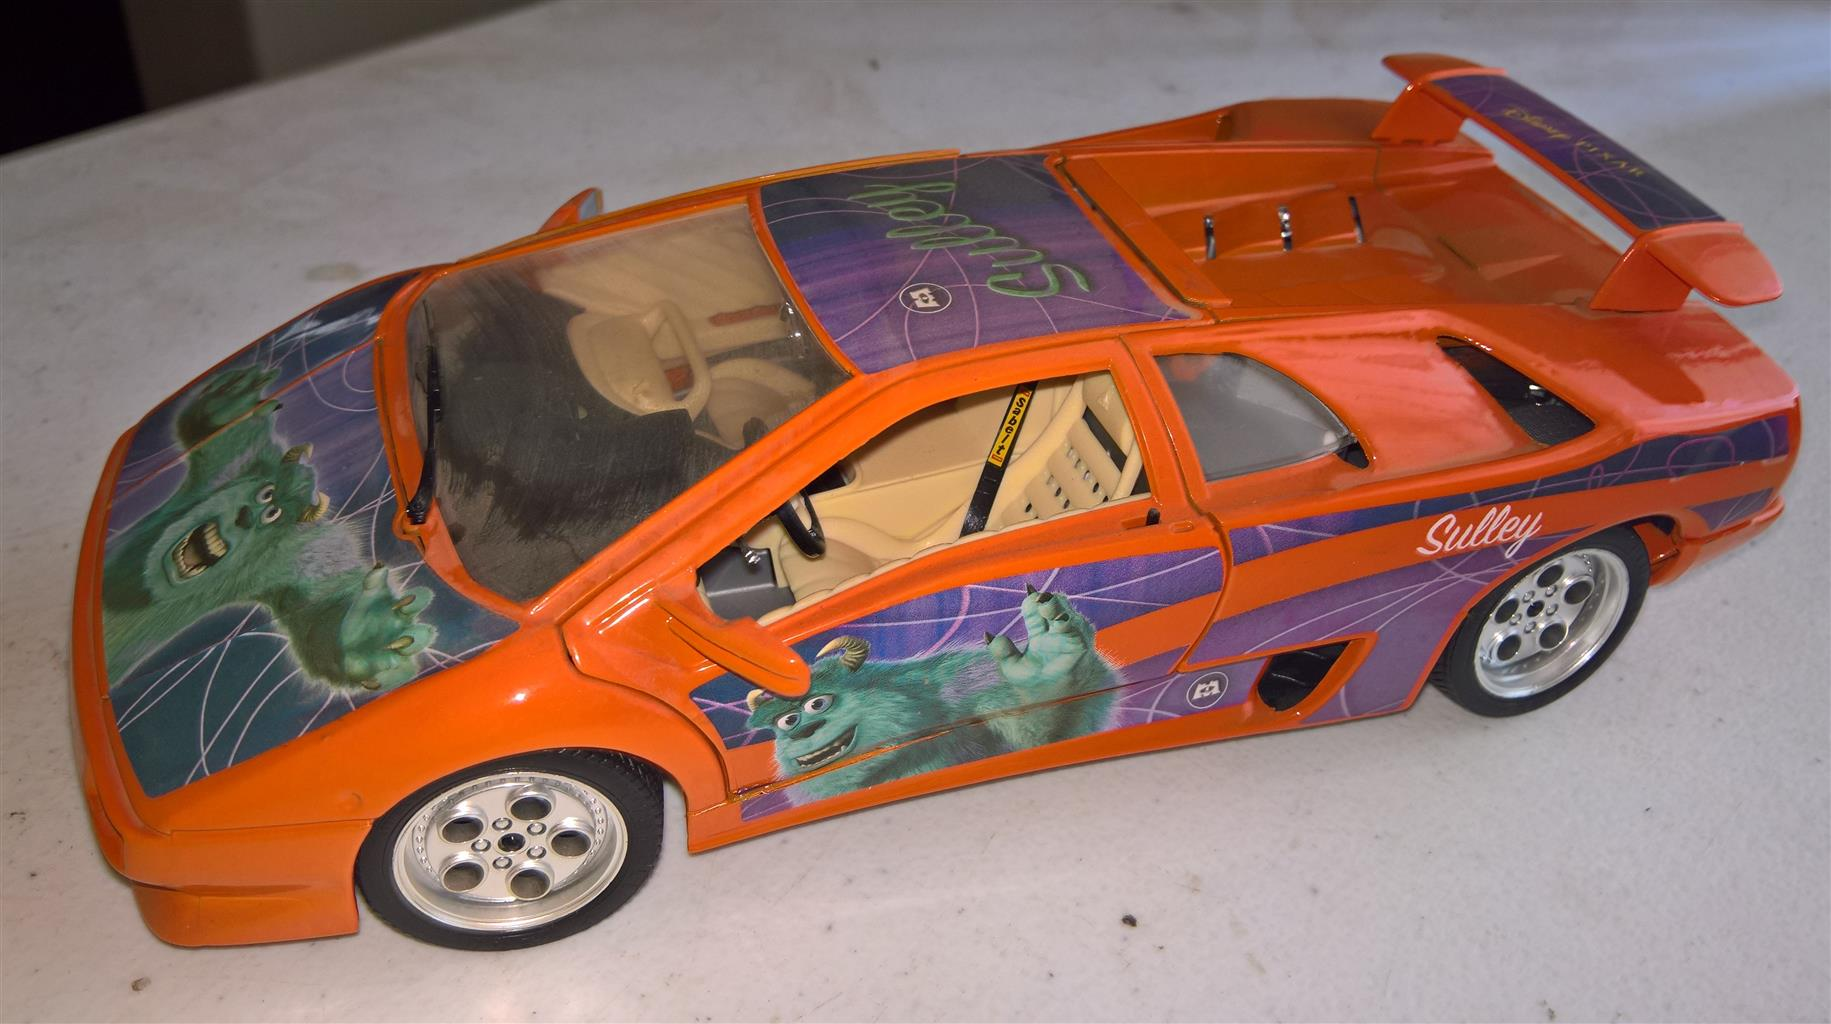 Model Cars For Sale >> Lamborghini 1 18 Model Cars For Sale